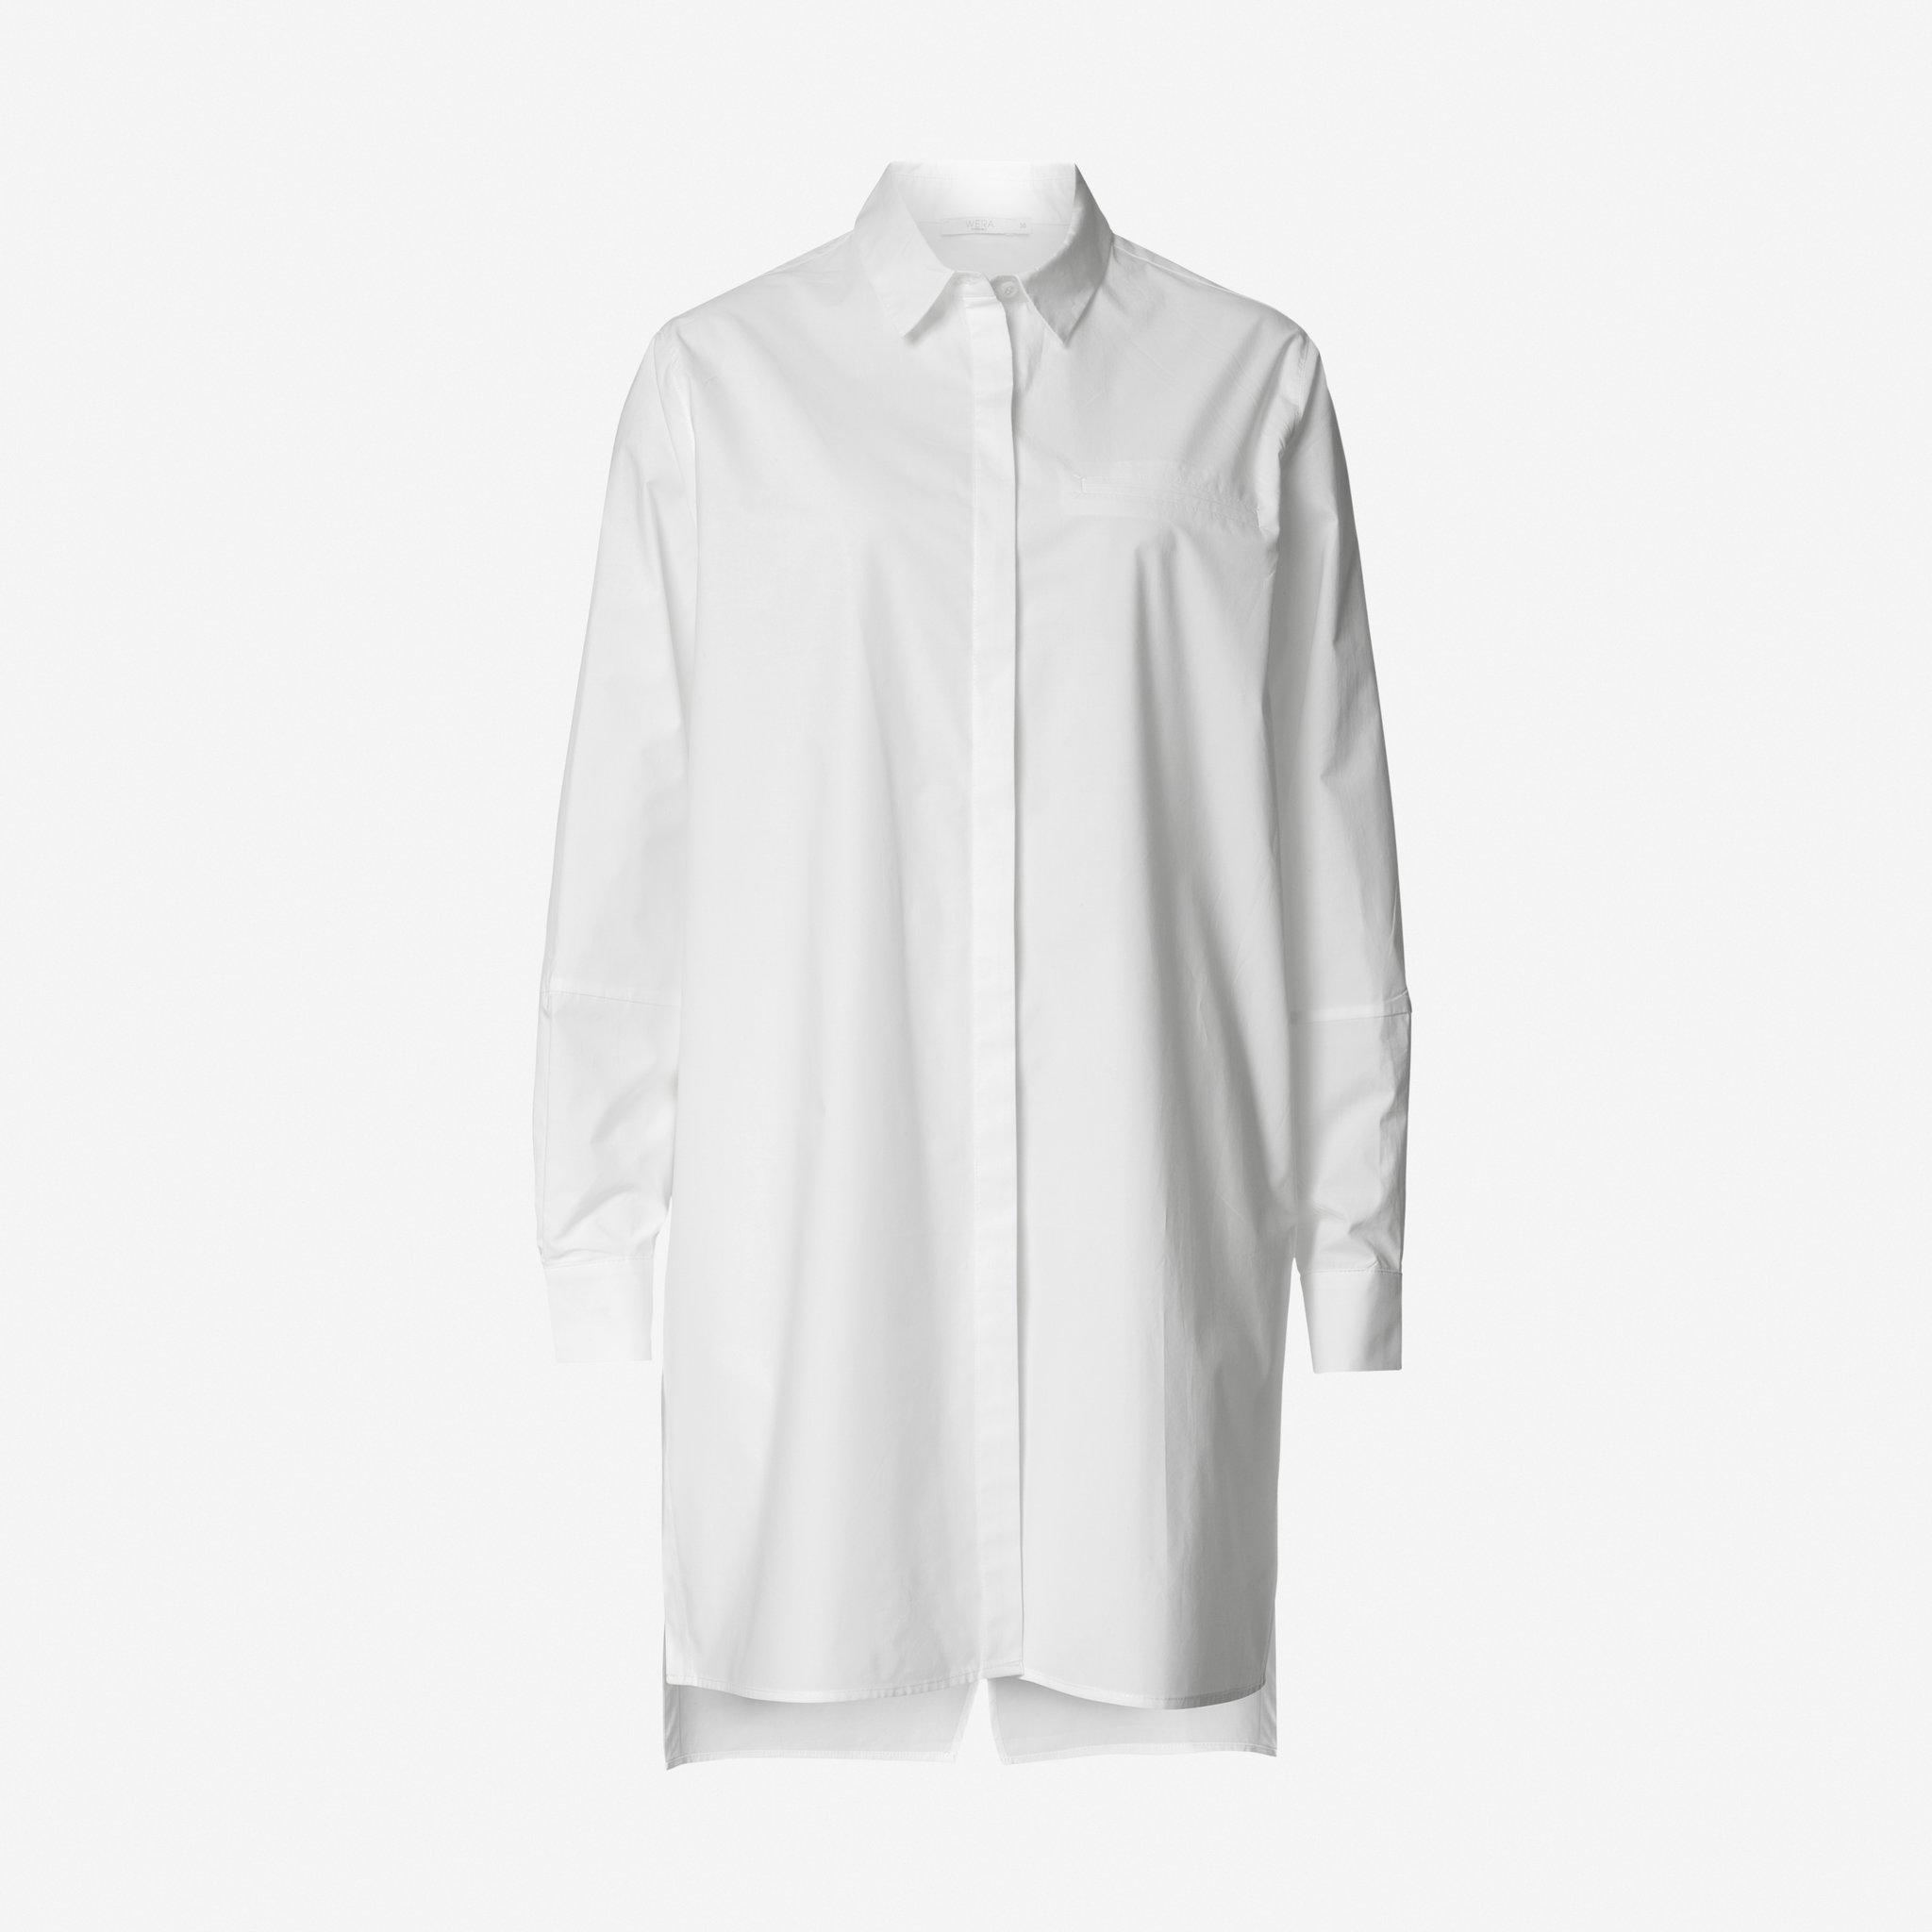 Skjorta i lång modell - Blusar   skjortor - Köp online på åhlens.se! 74e3fe3b38869